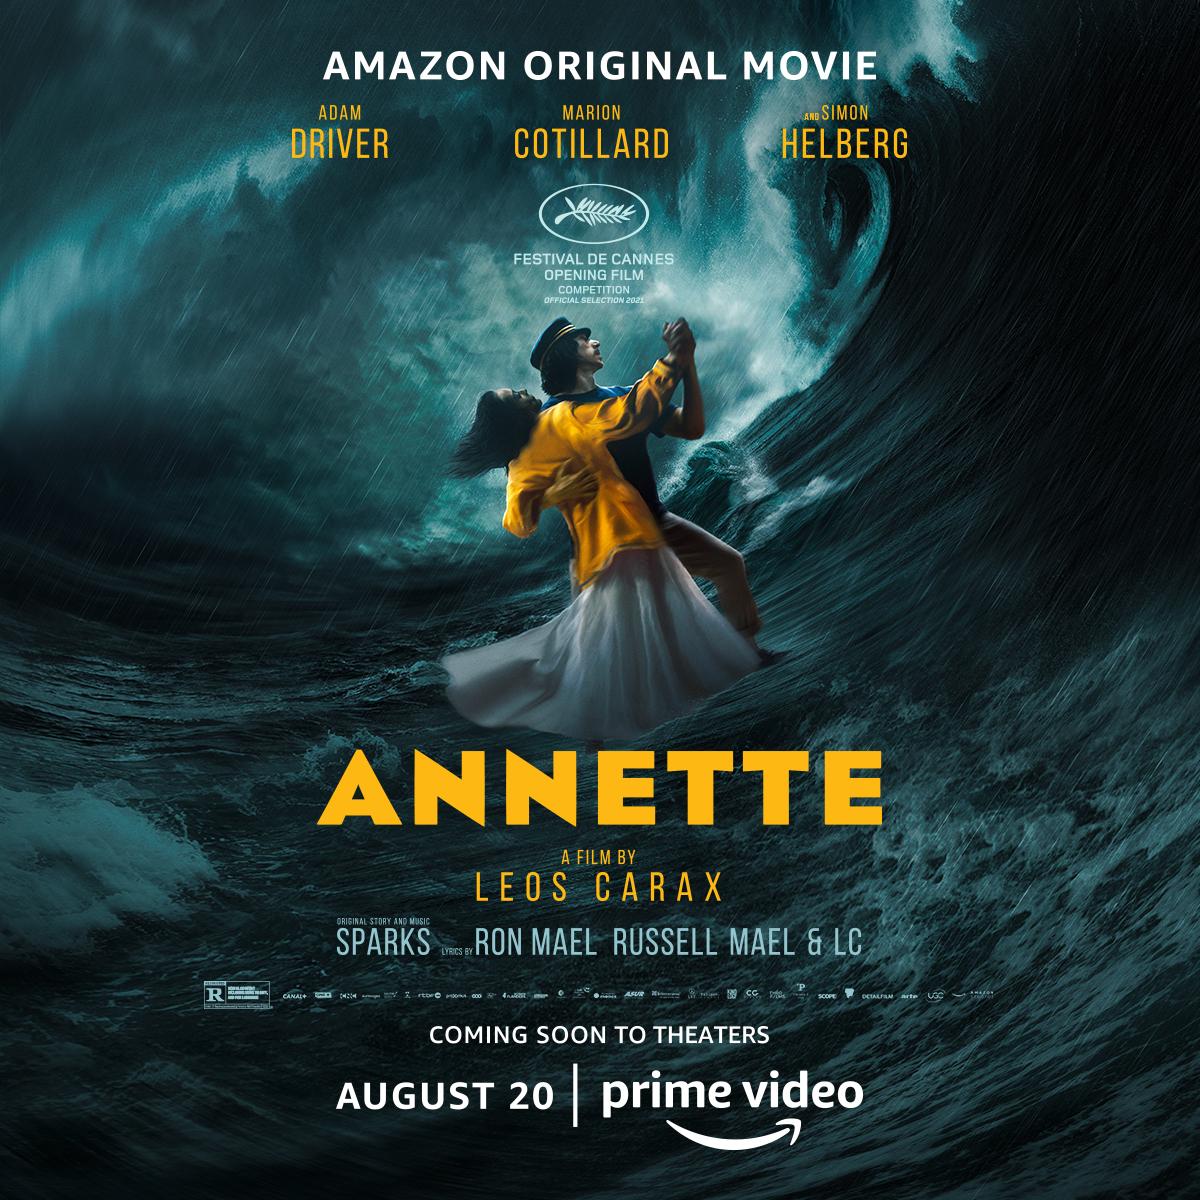 'Annette': Adam Driver e Marion Cotillard vivem romance intenso em novo trailer